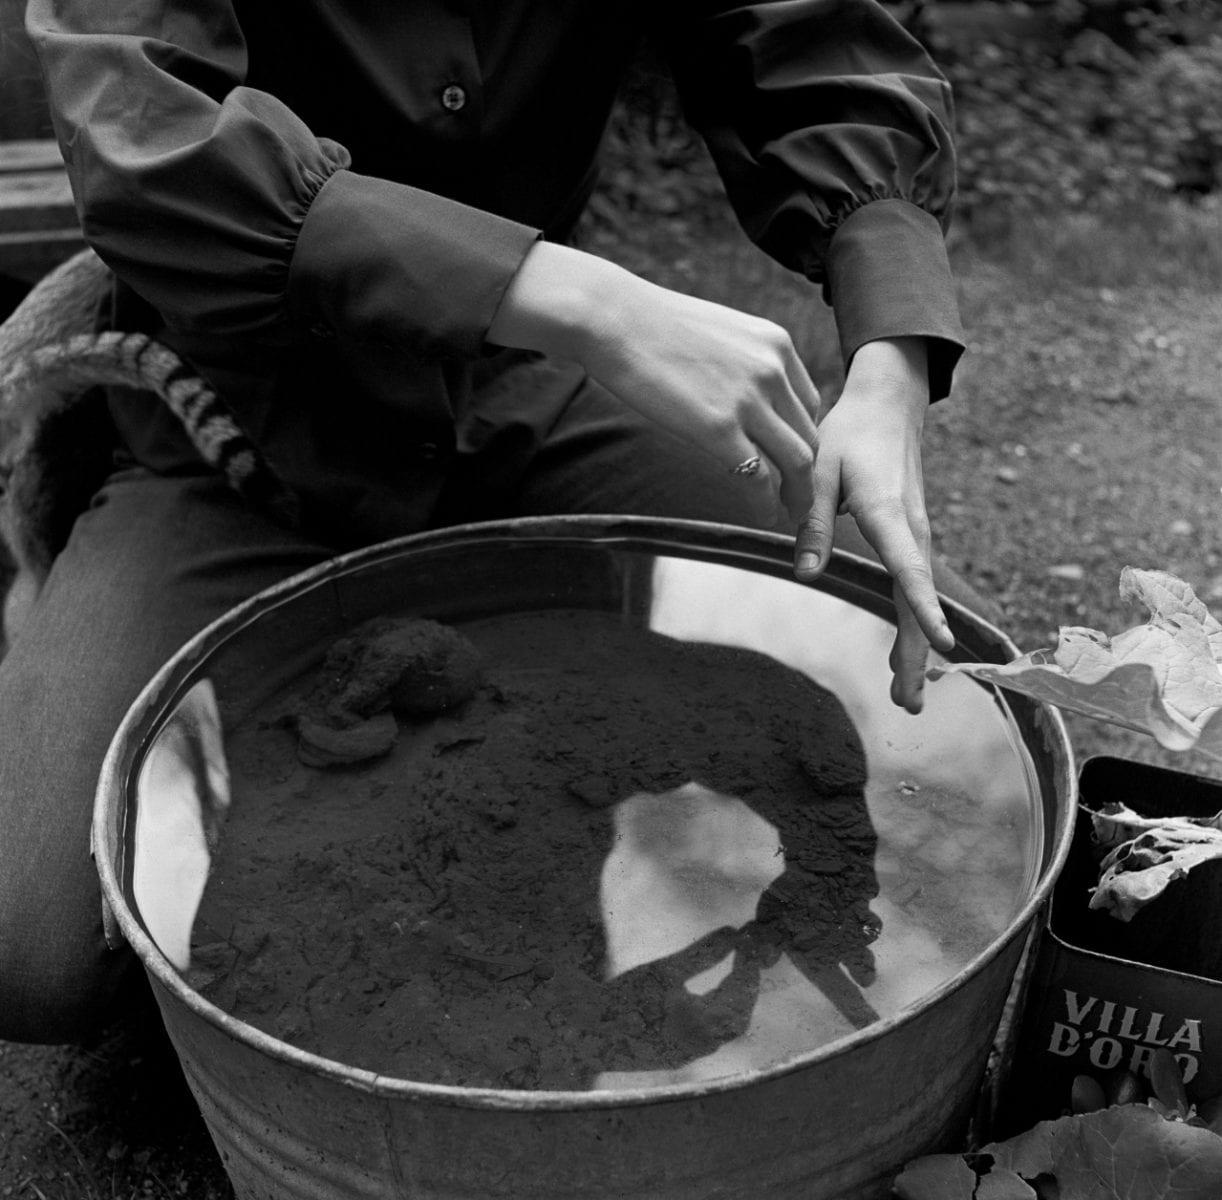 Aiko's hands, 1971 © Imogen Cunningham